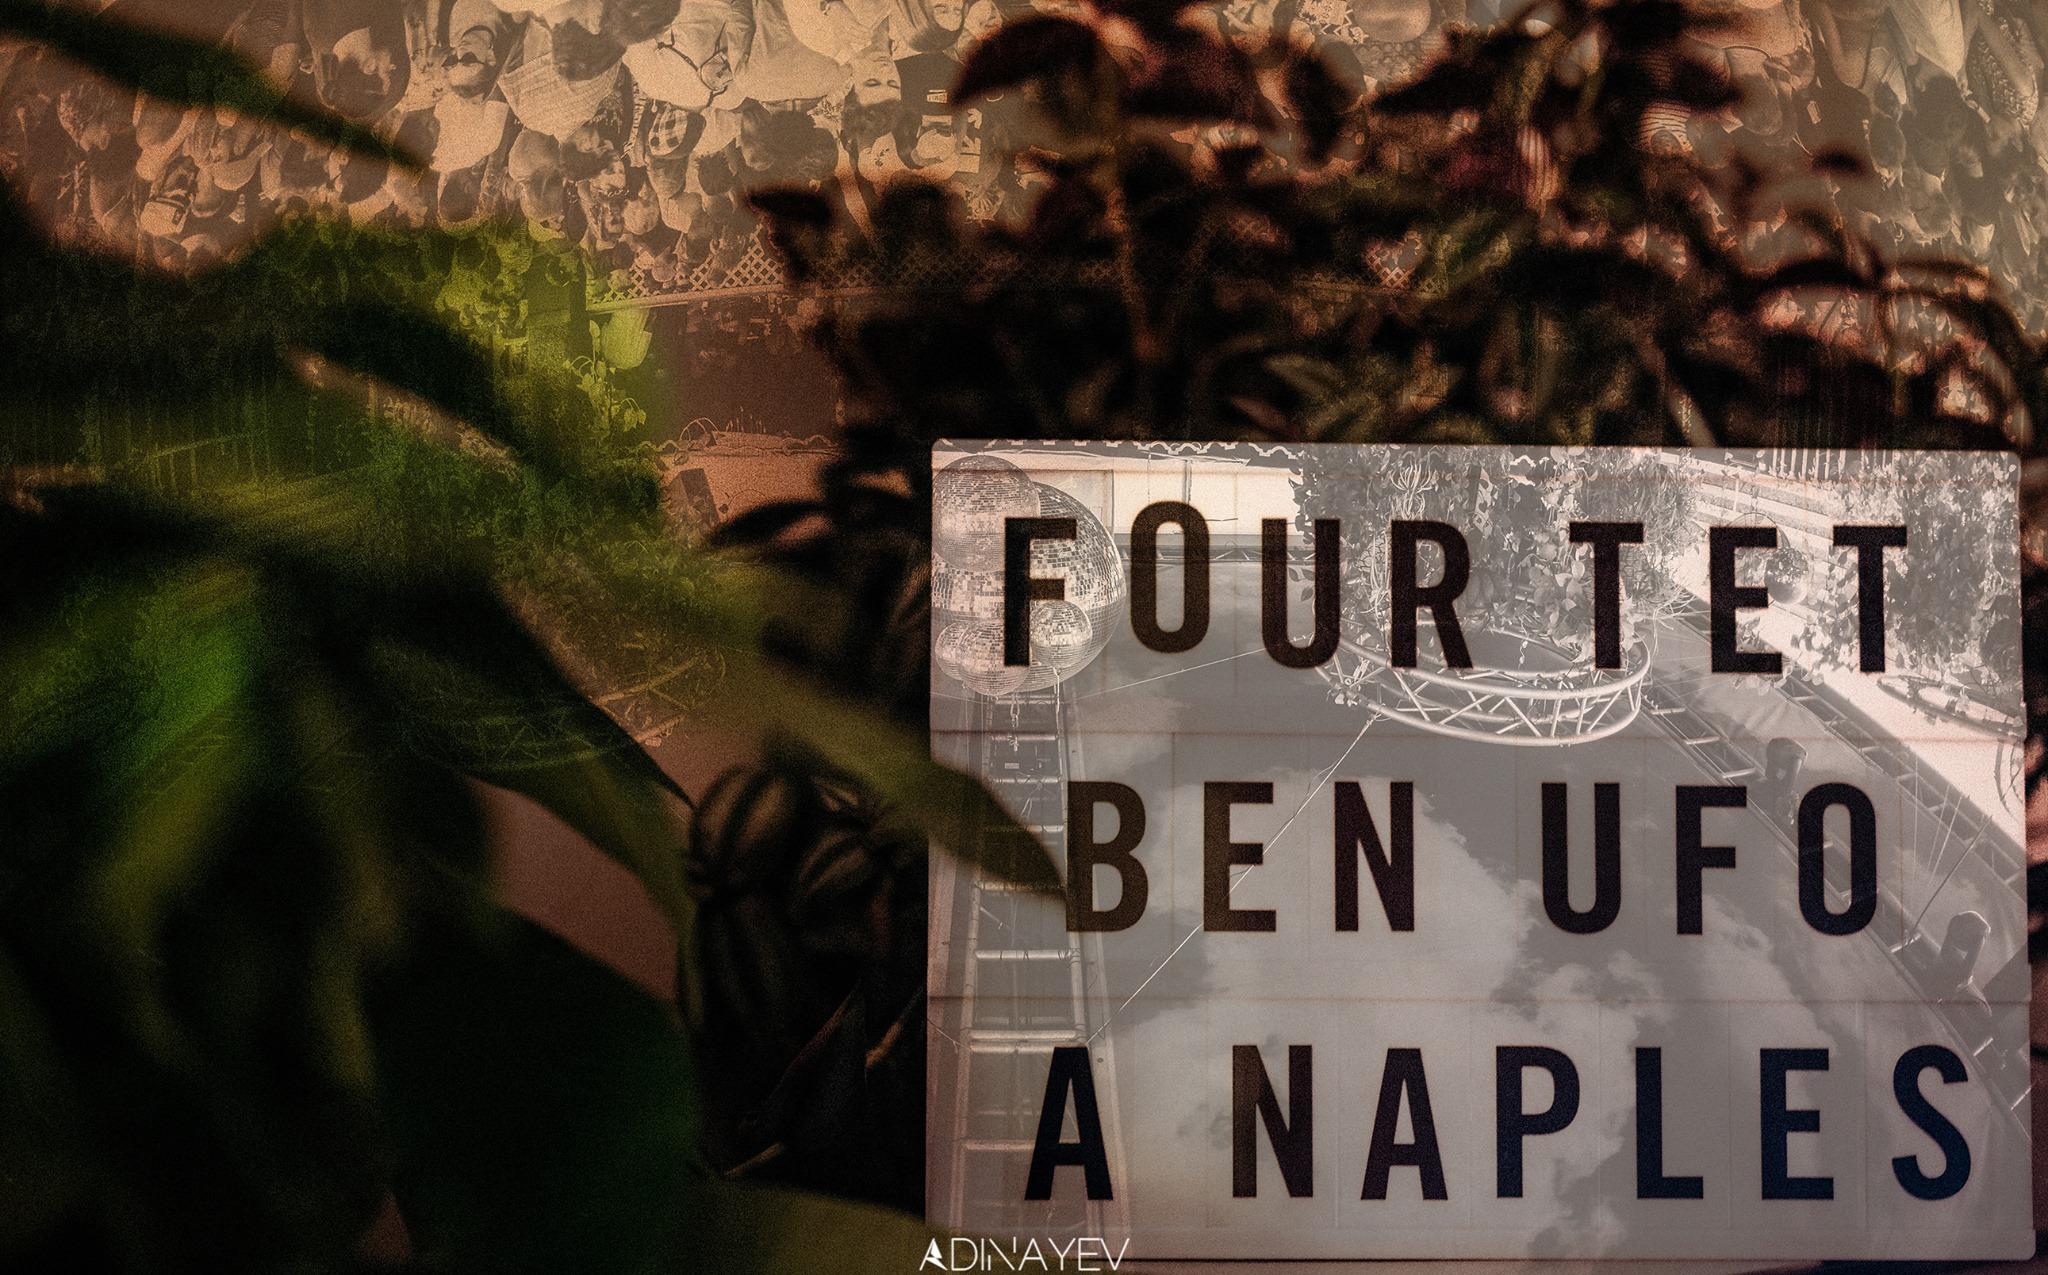 Four Tet + Ben UFO + Anthony Naples / May 25